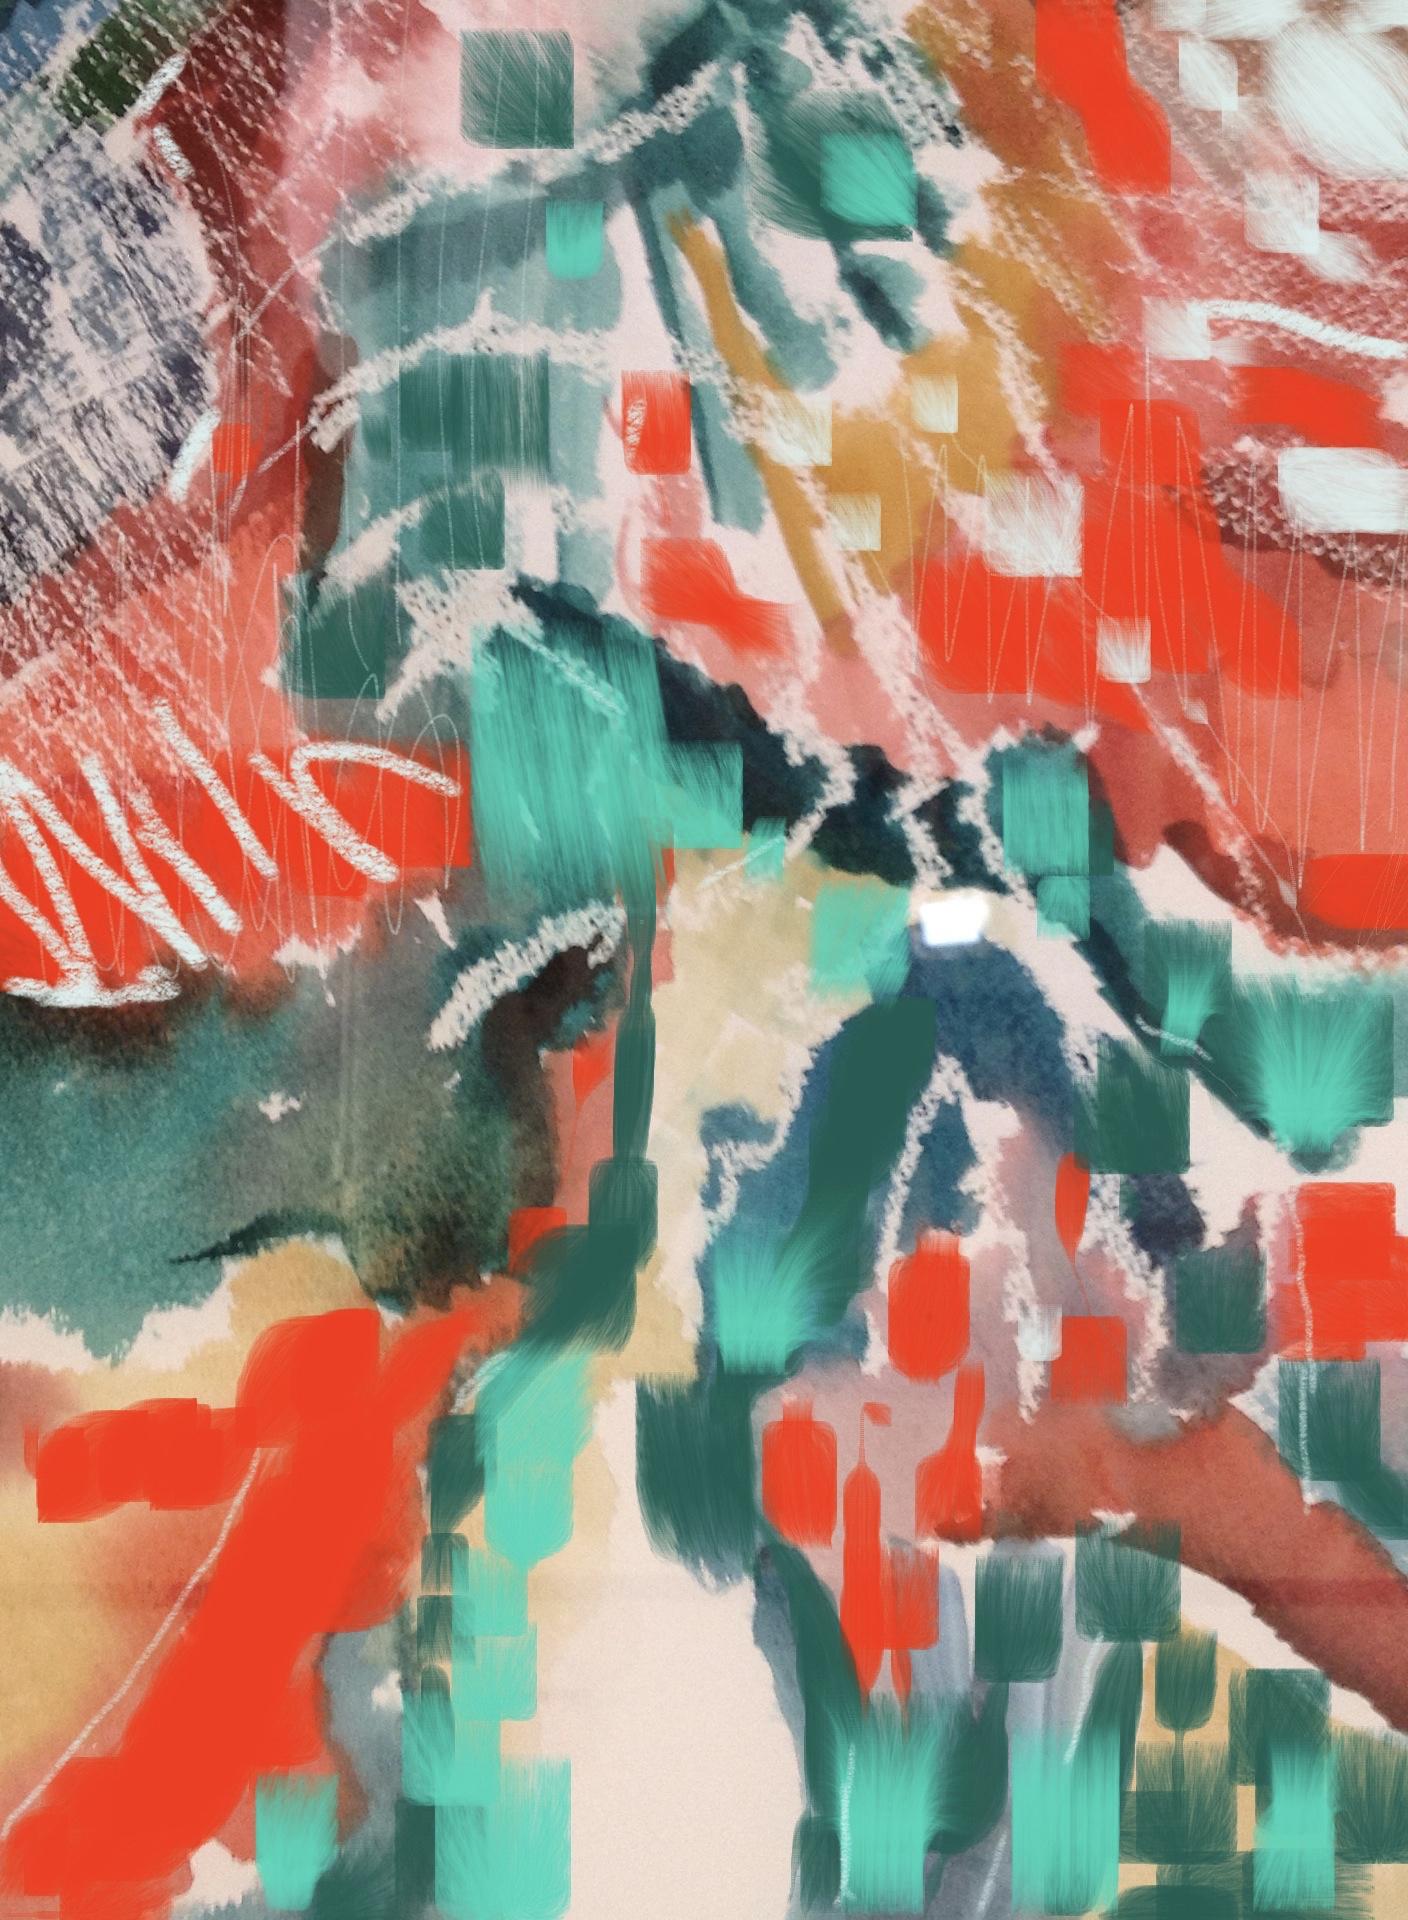 Tormenta en la selva (2014) - Josefina Aguirre